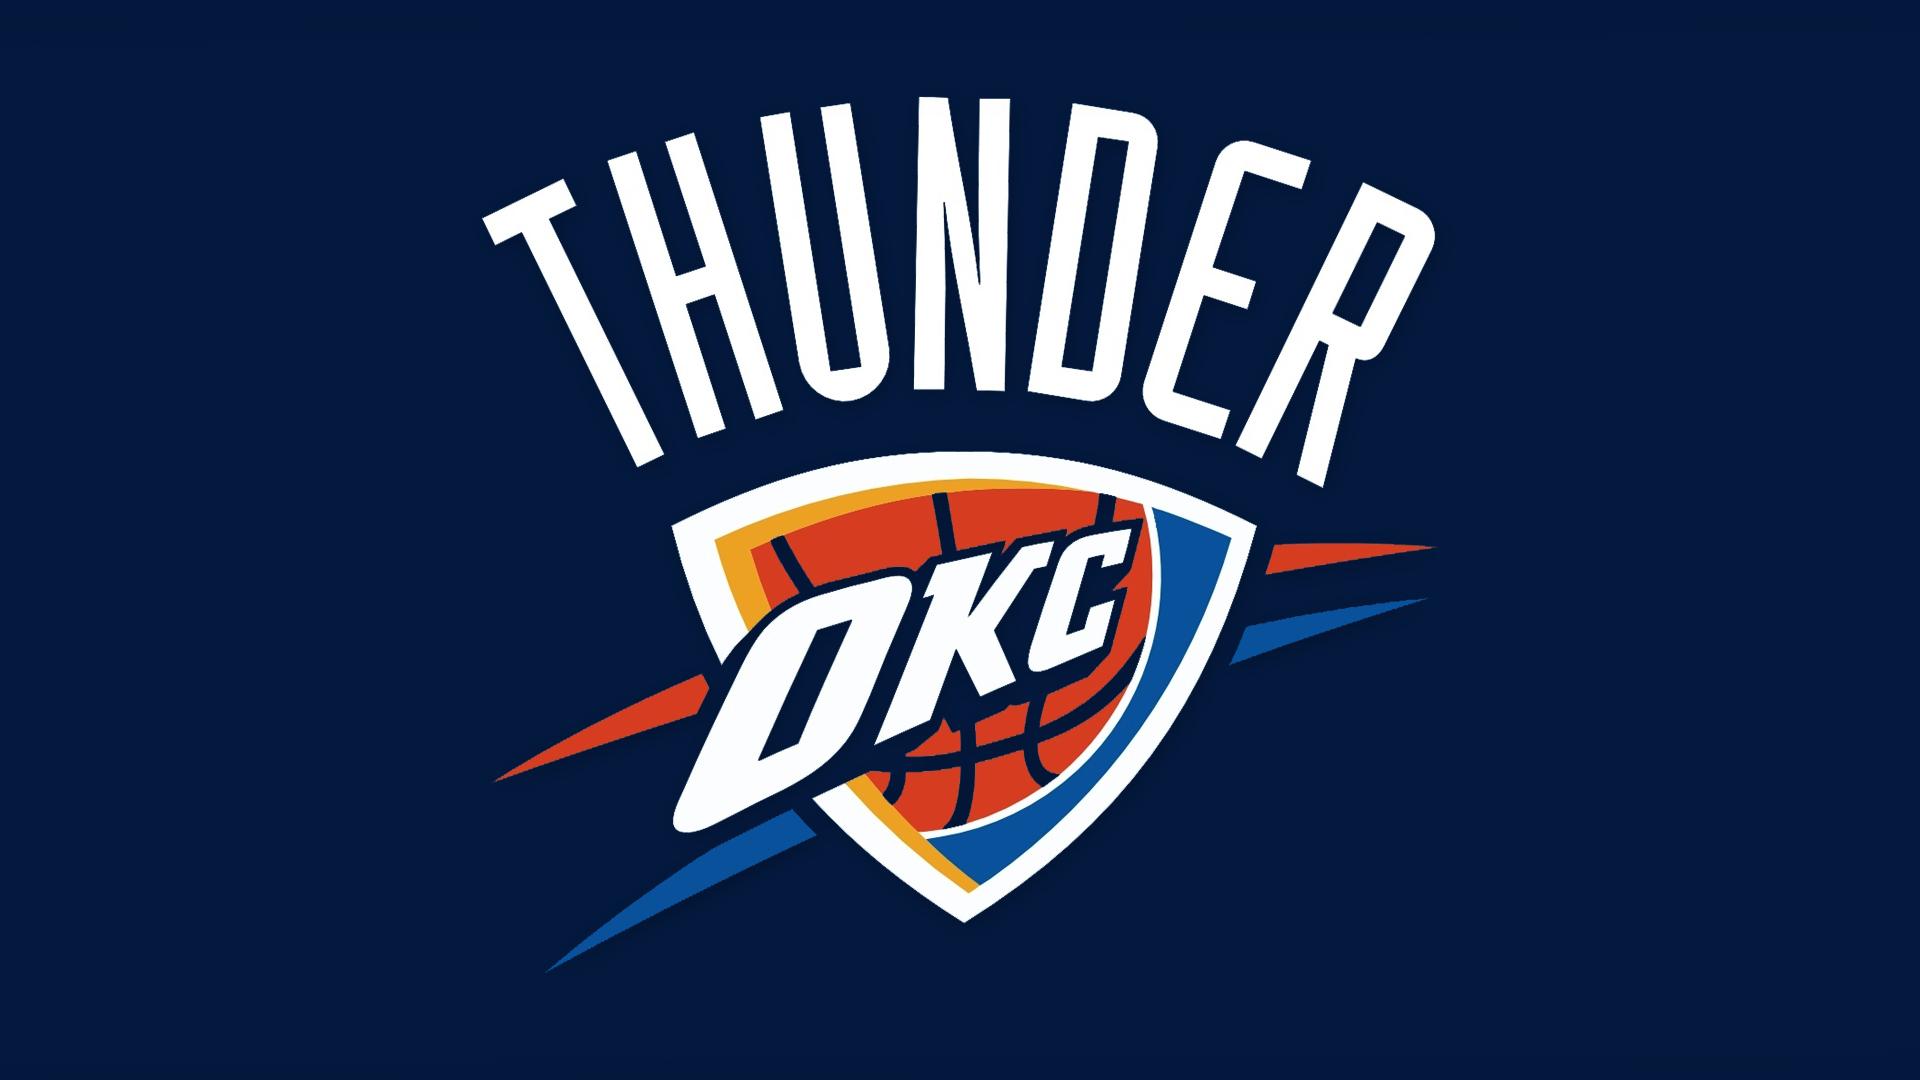 Okc Thunder Logo Nike 419390 Hd Wallpaper Backgrounds